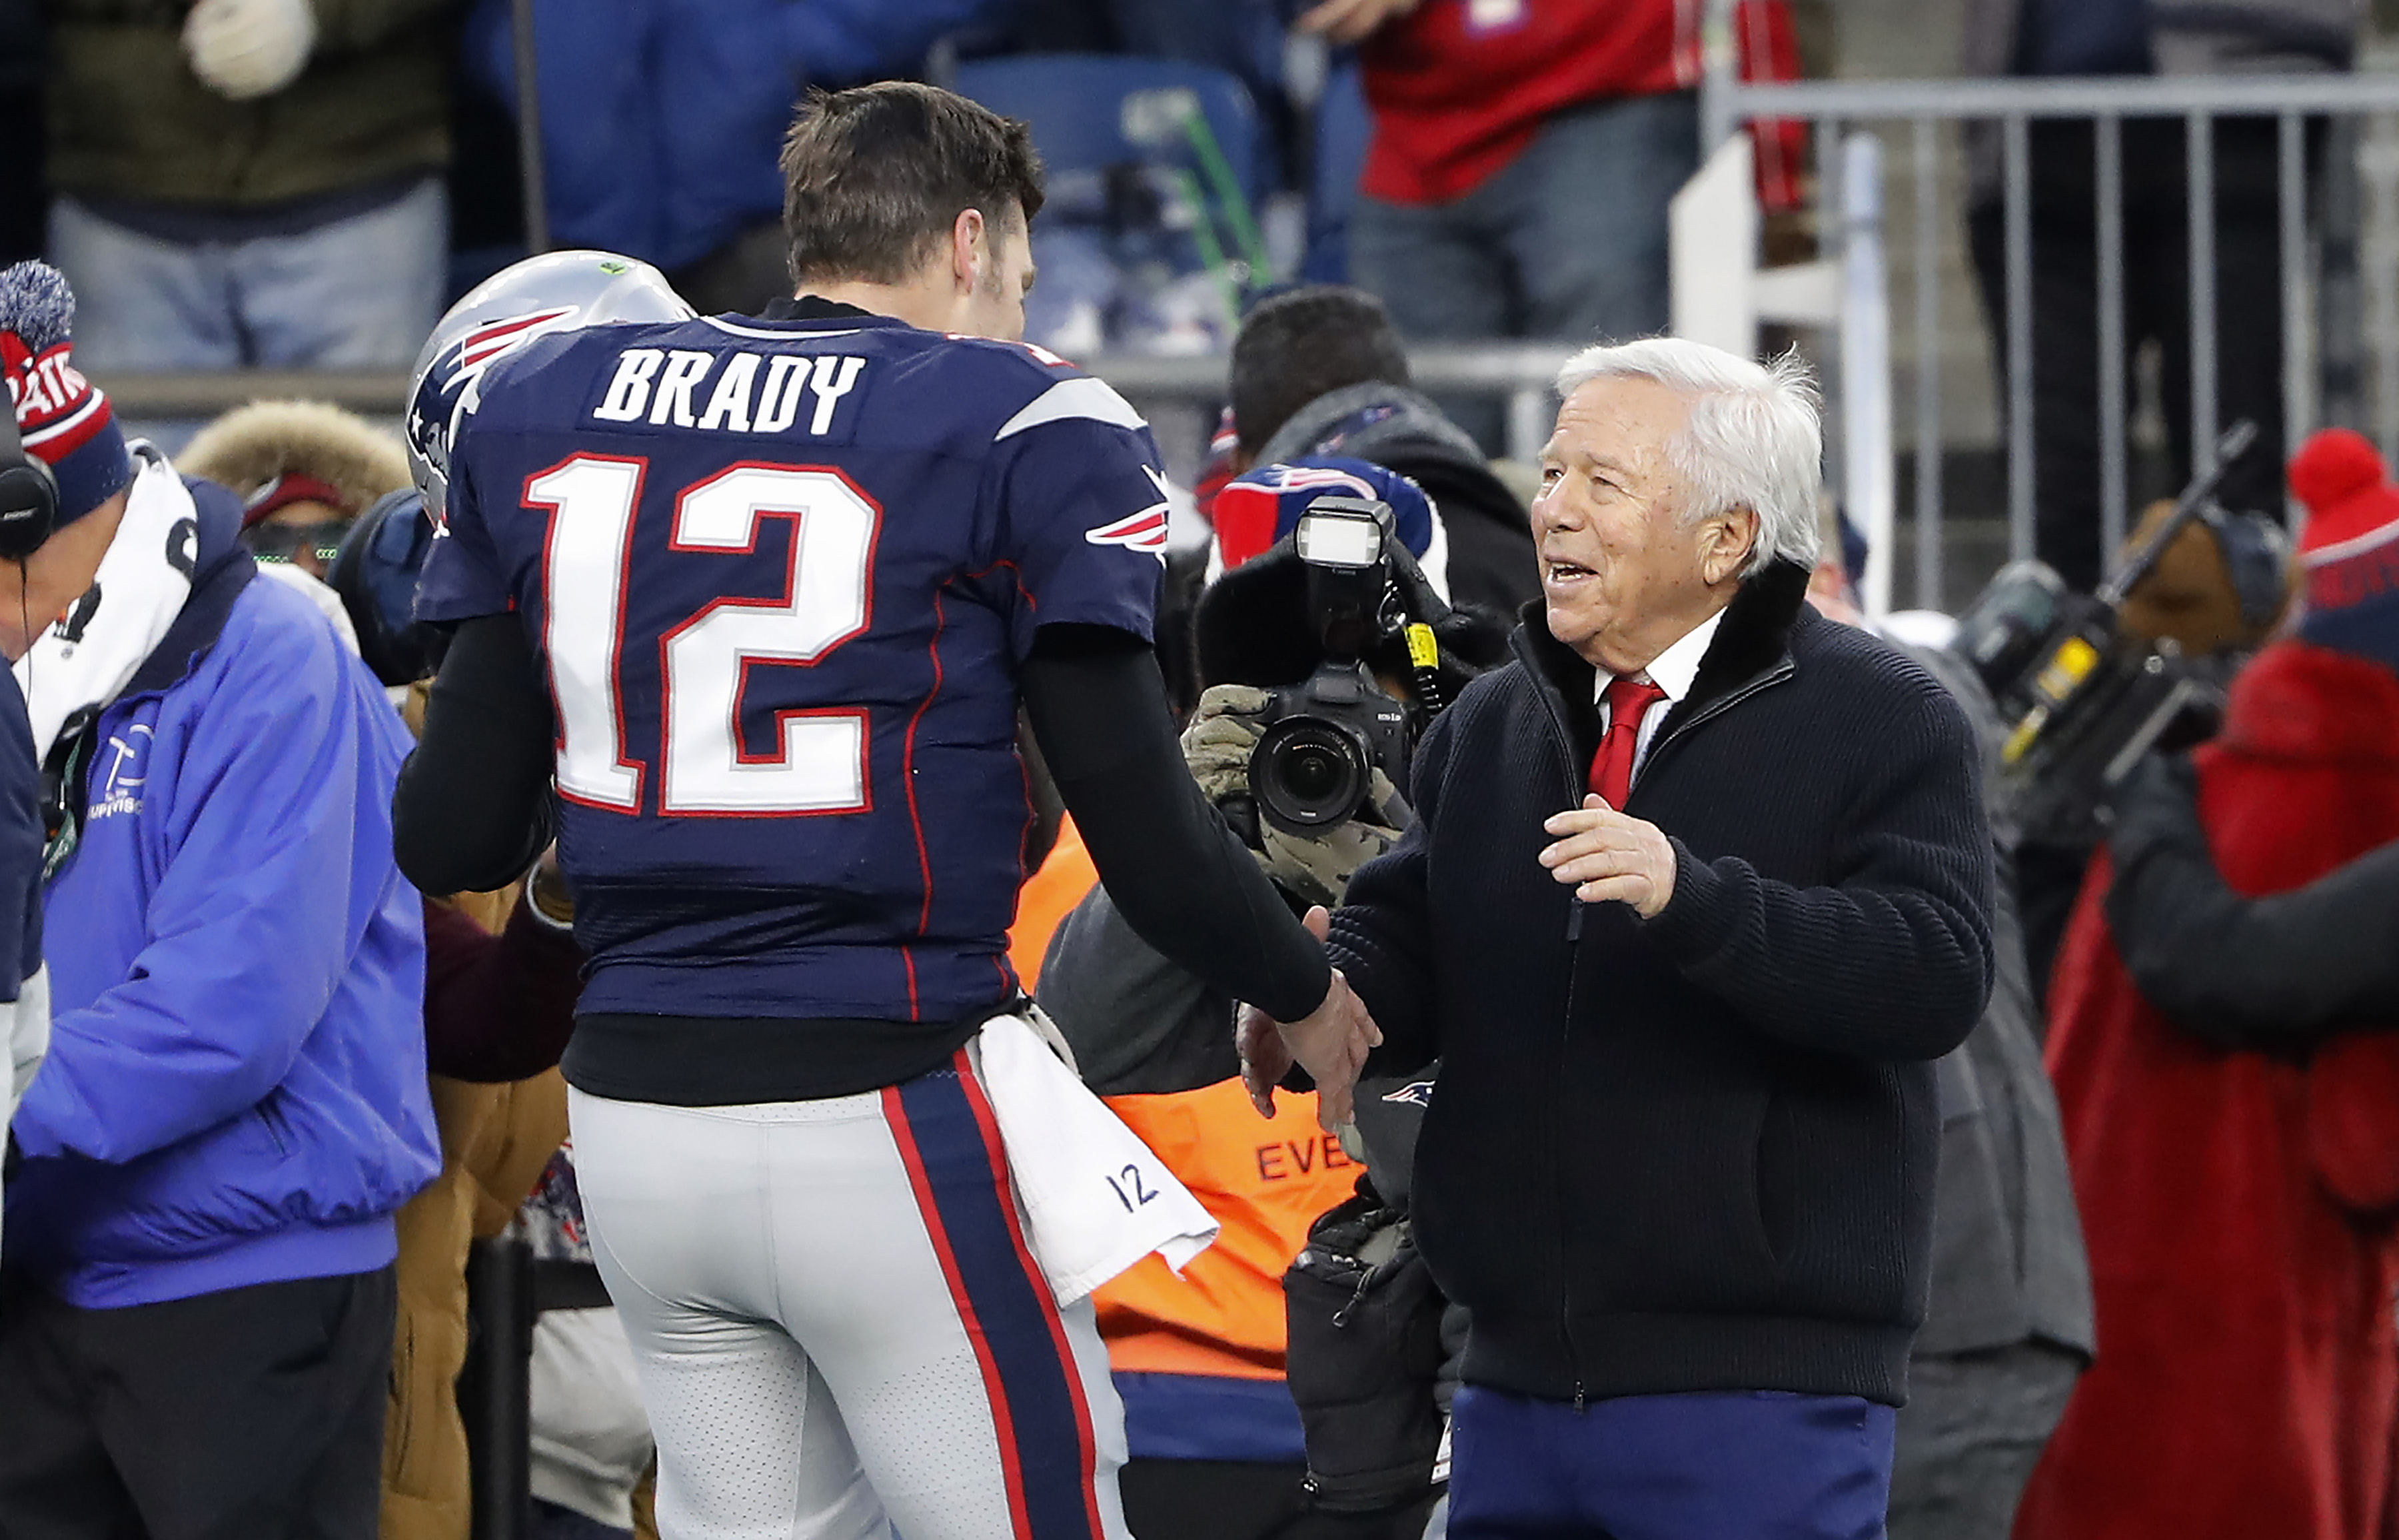 Yahoo! Finance: Patriots' Robert Kraft is 7th Richest NFL Owner